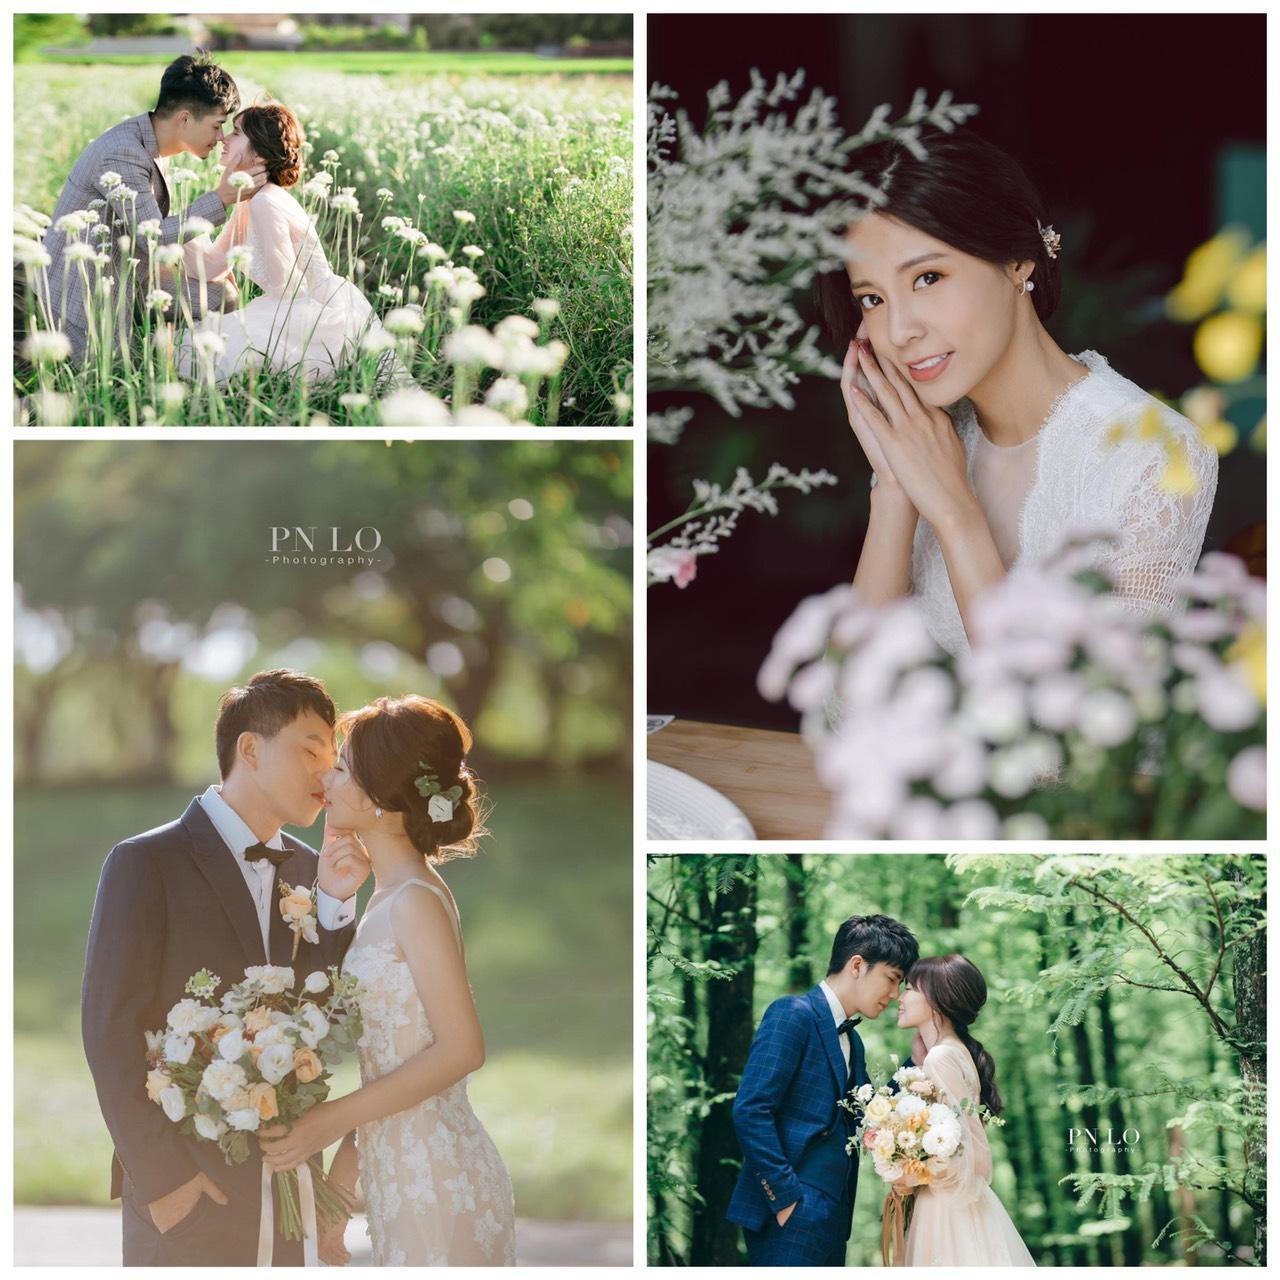 PNLO Photography,新竹婚紗,桃園婚紗推薦,台北婚紗